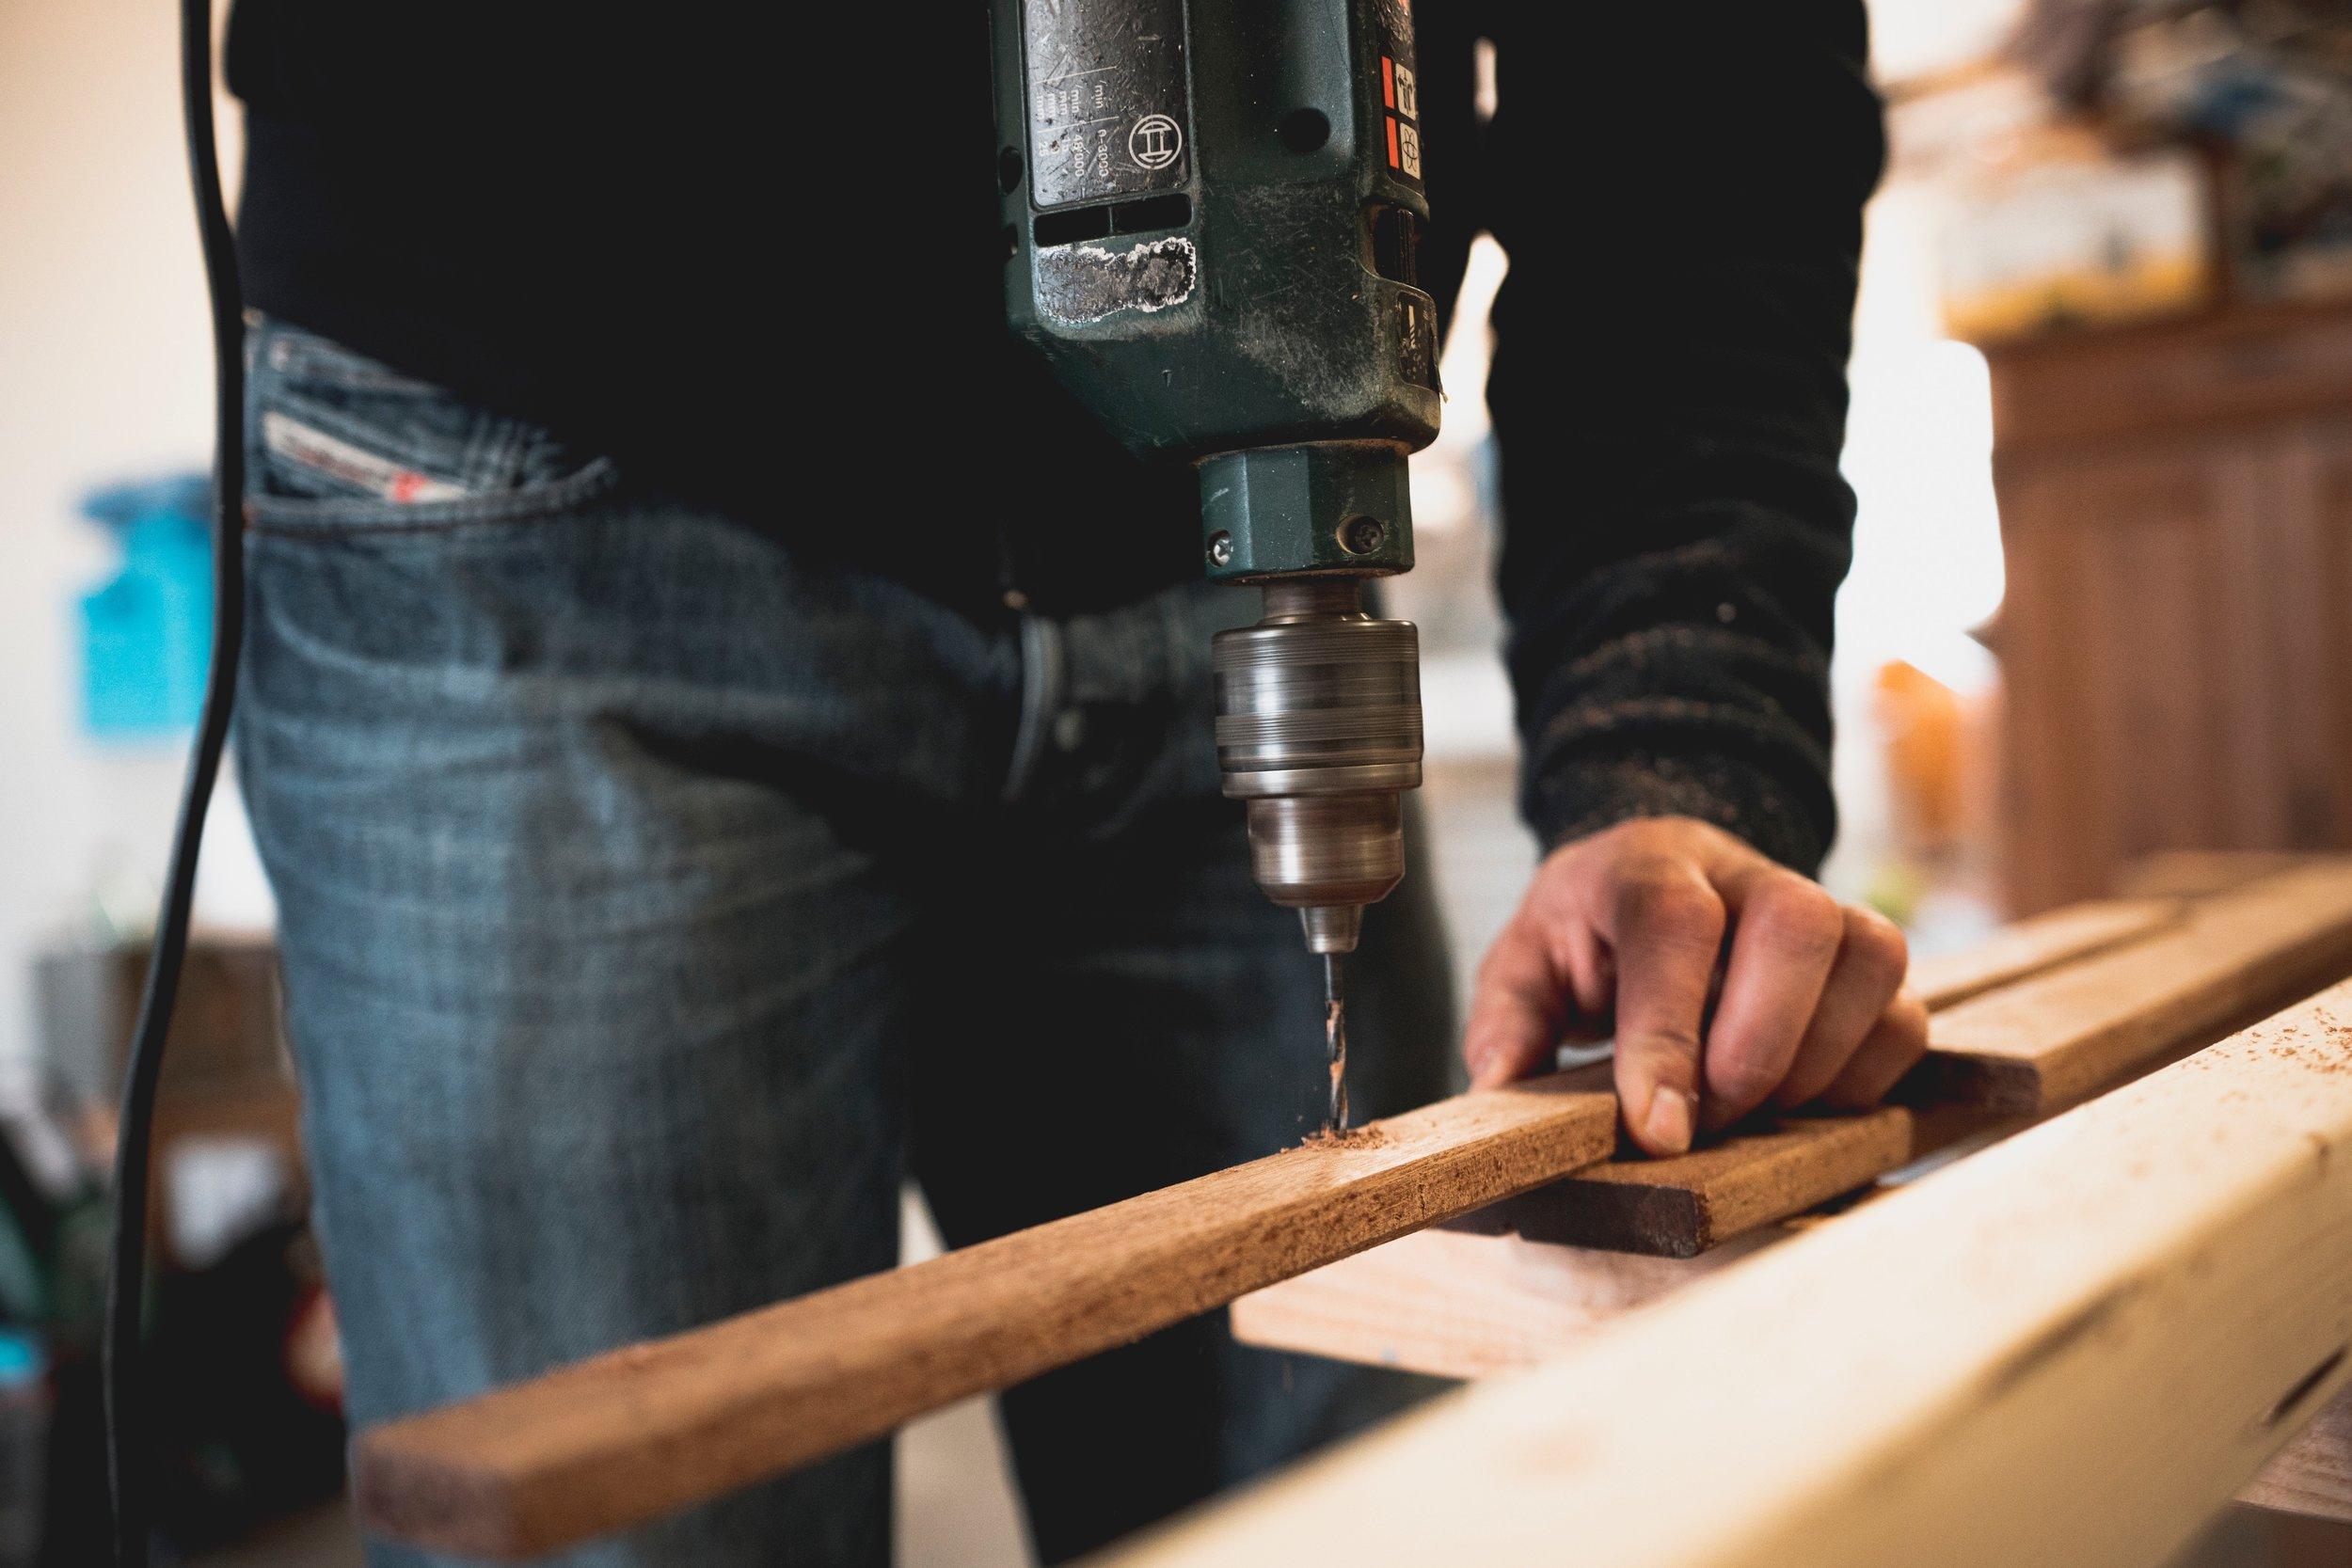 adult-artisan-carpentry-1094767.jpg